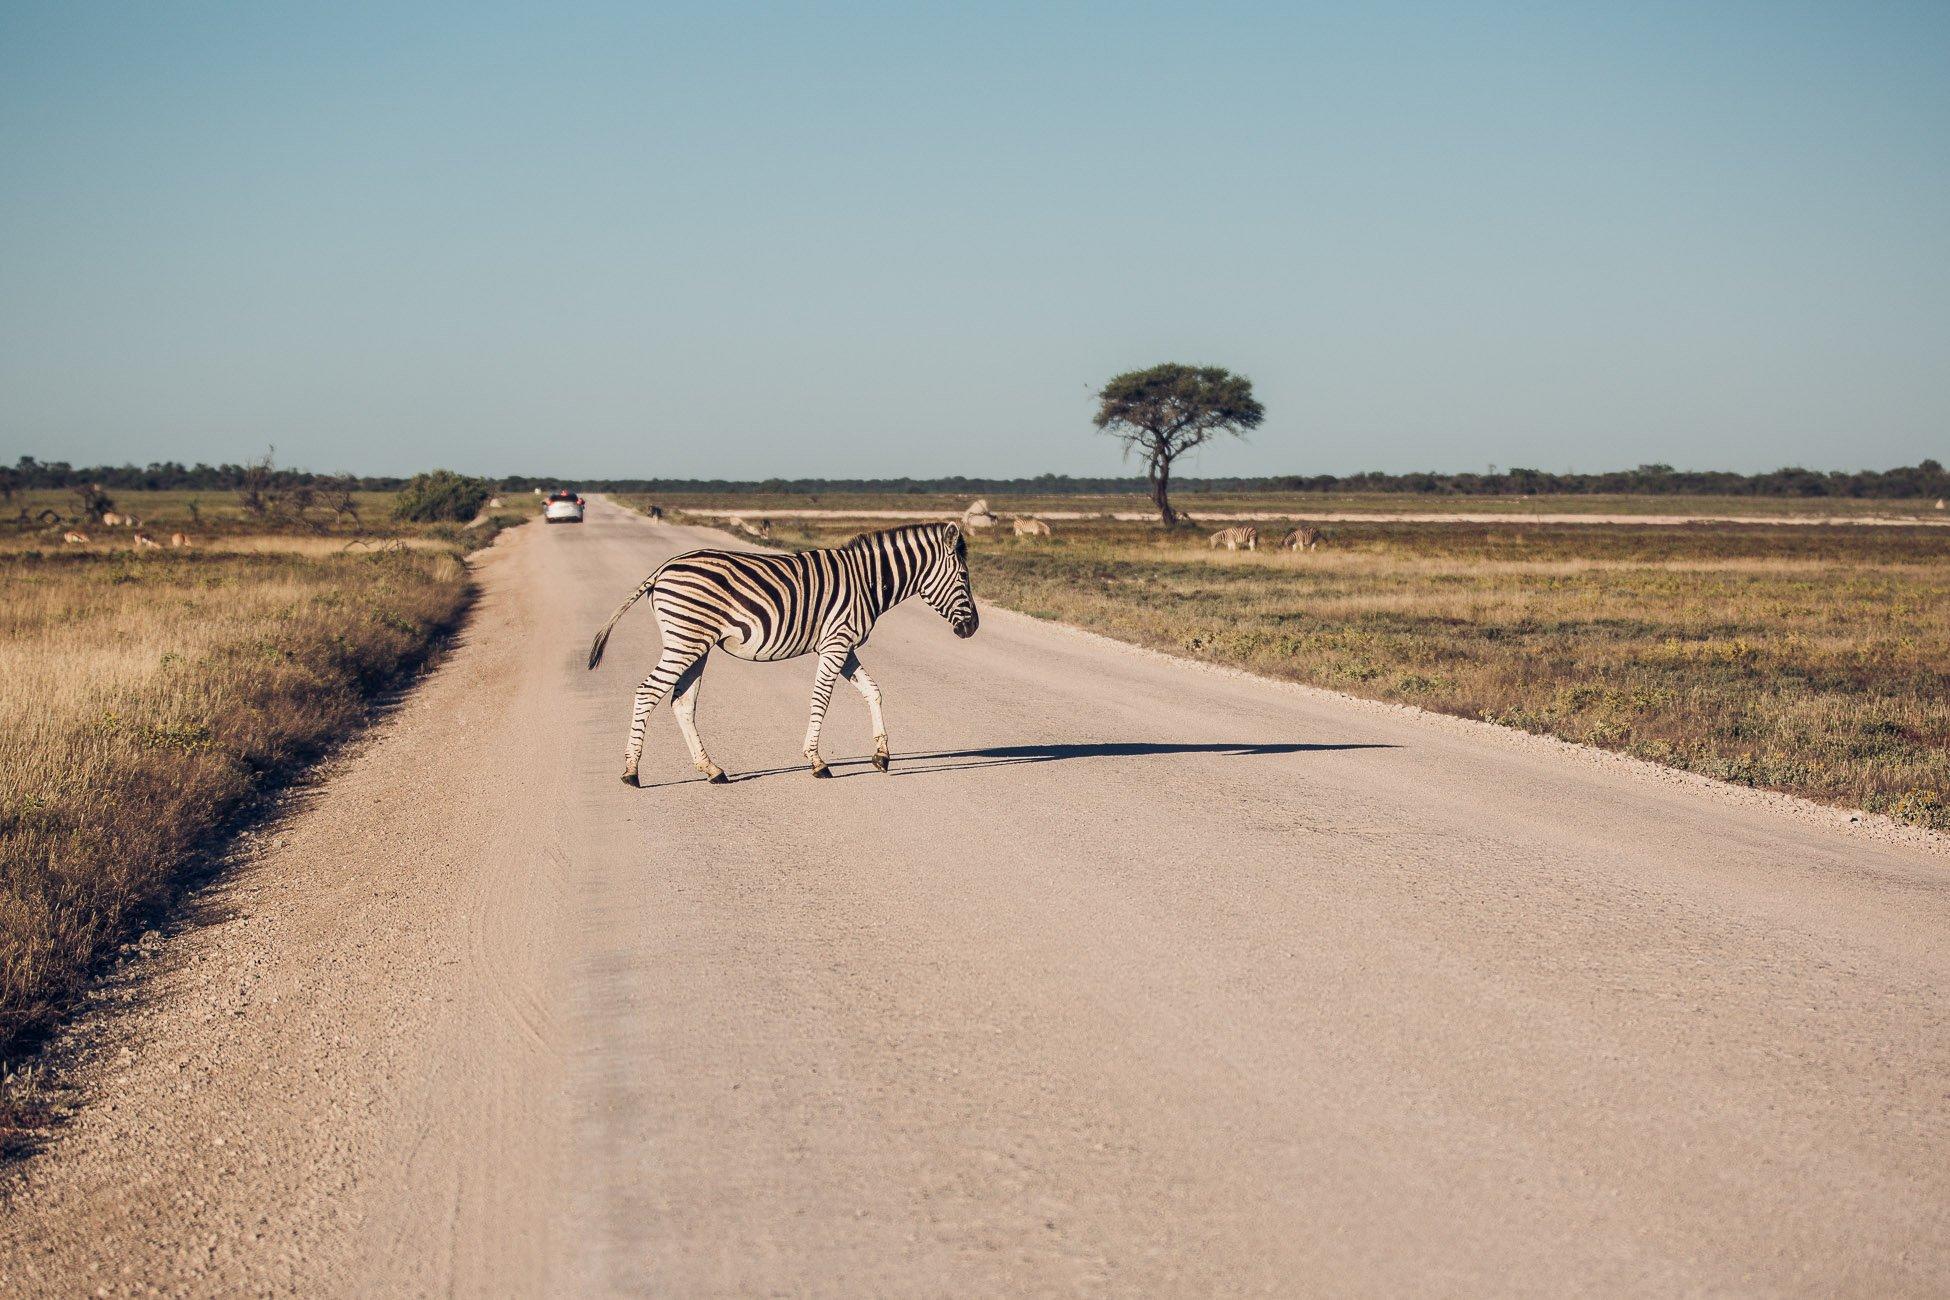 Zebra crossing a road at Etosha National Park